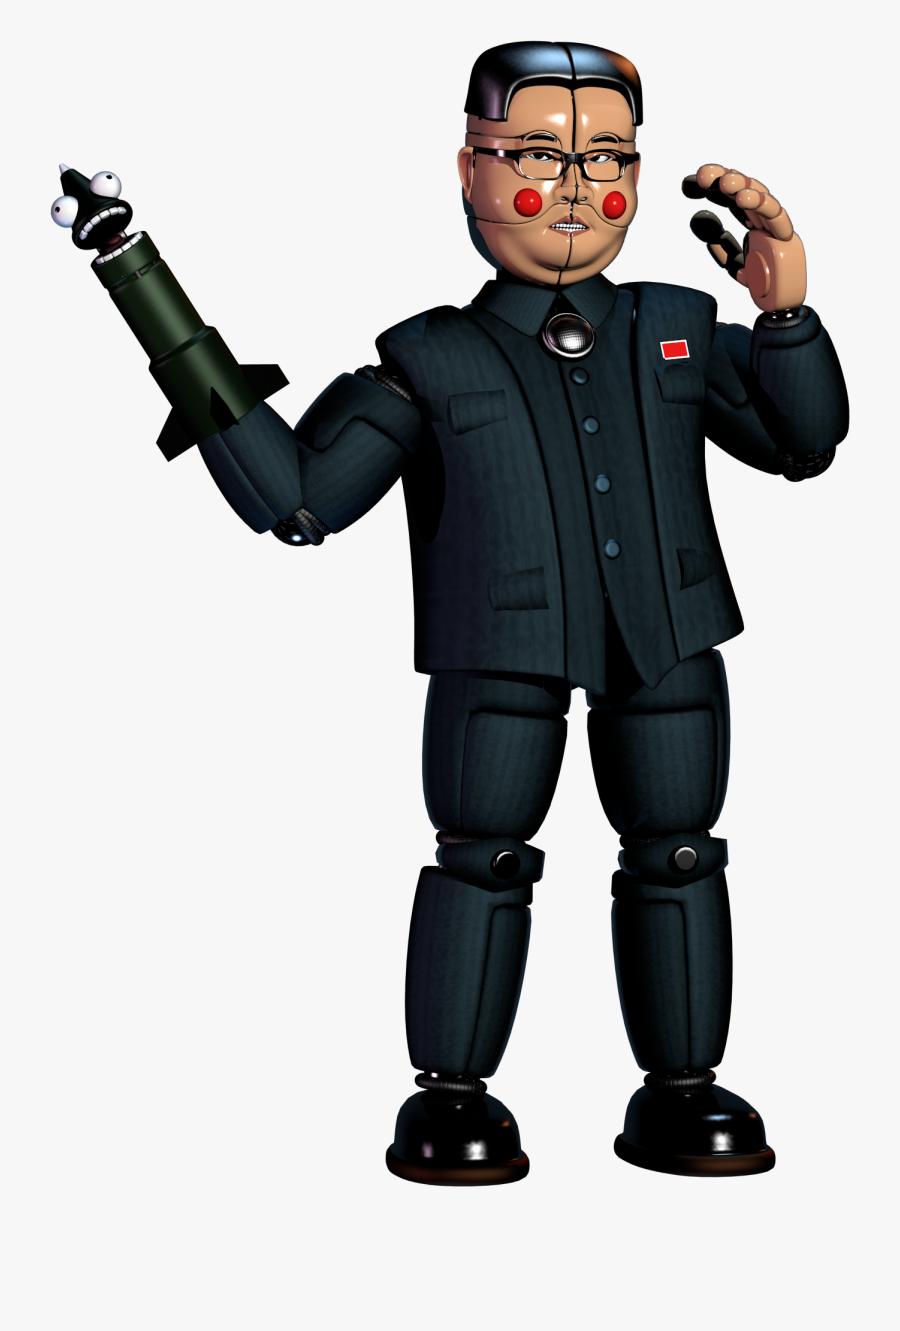 Clip Art Funtime And Nuke Model - Kim Jong Un Animatronic, Transparent Clipart